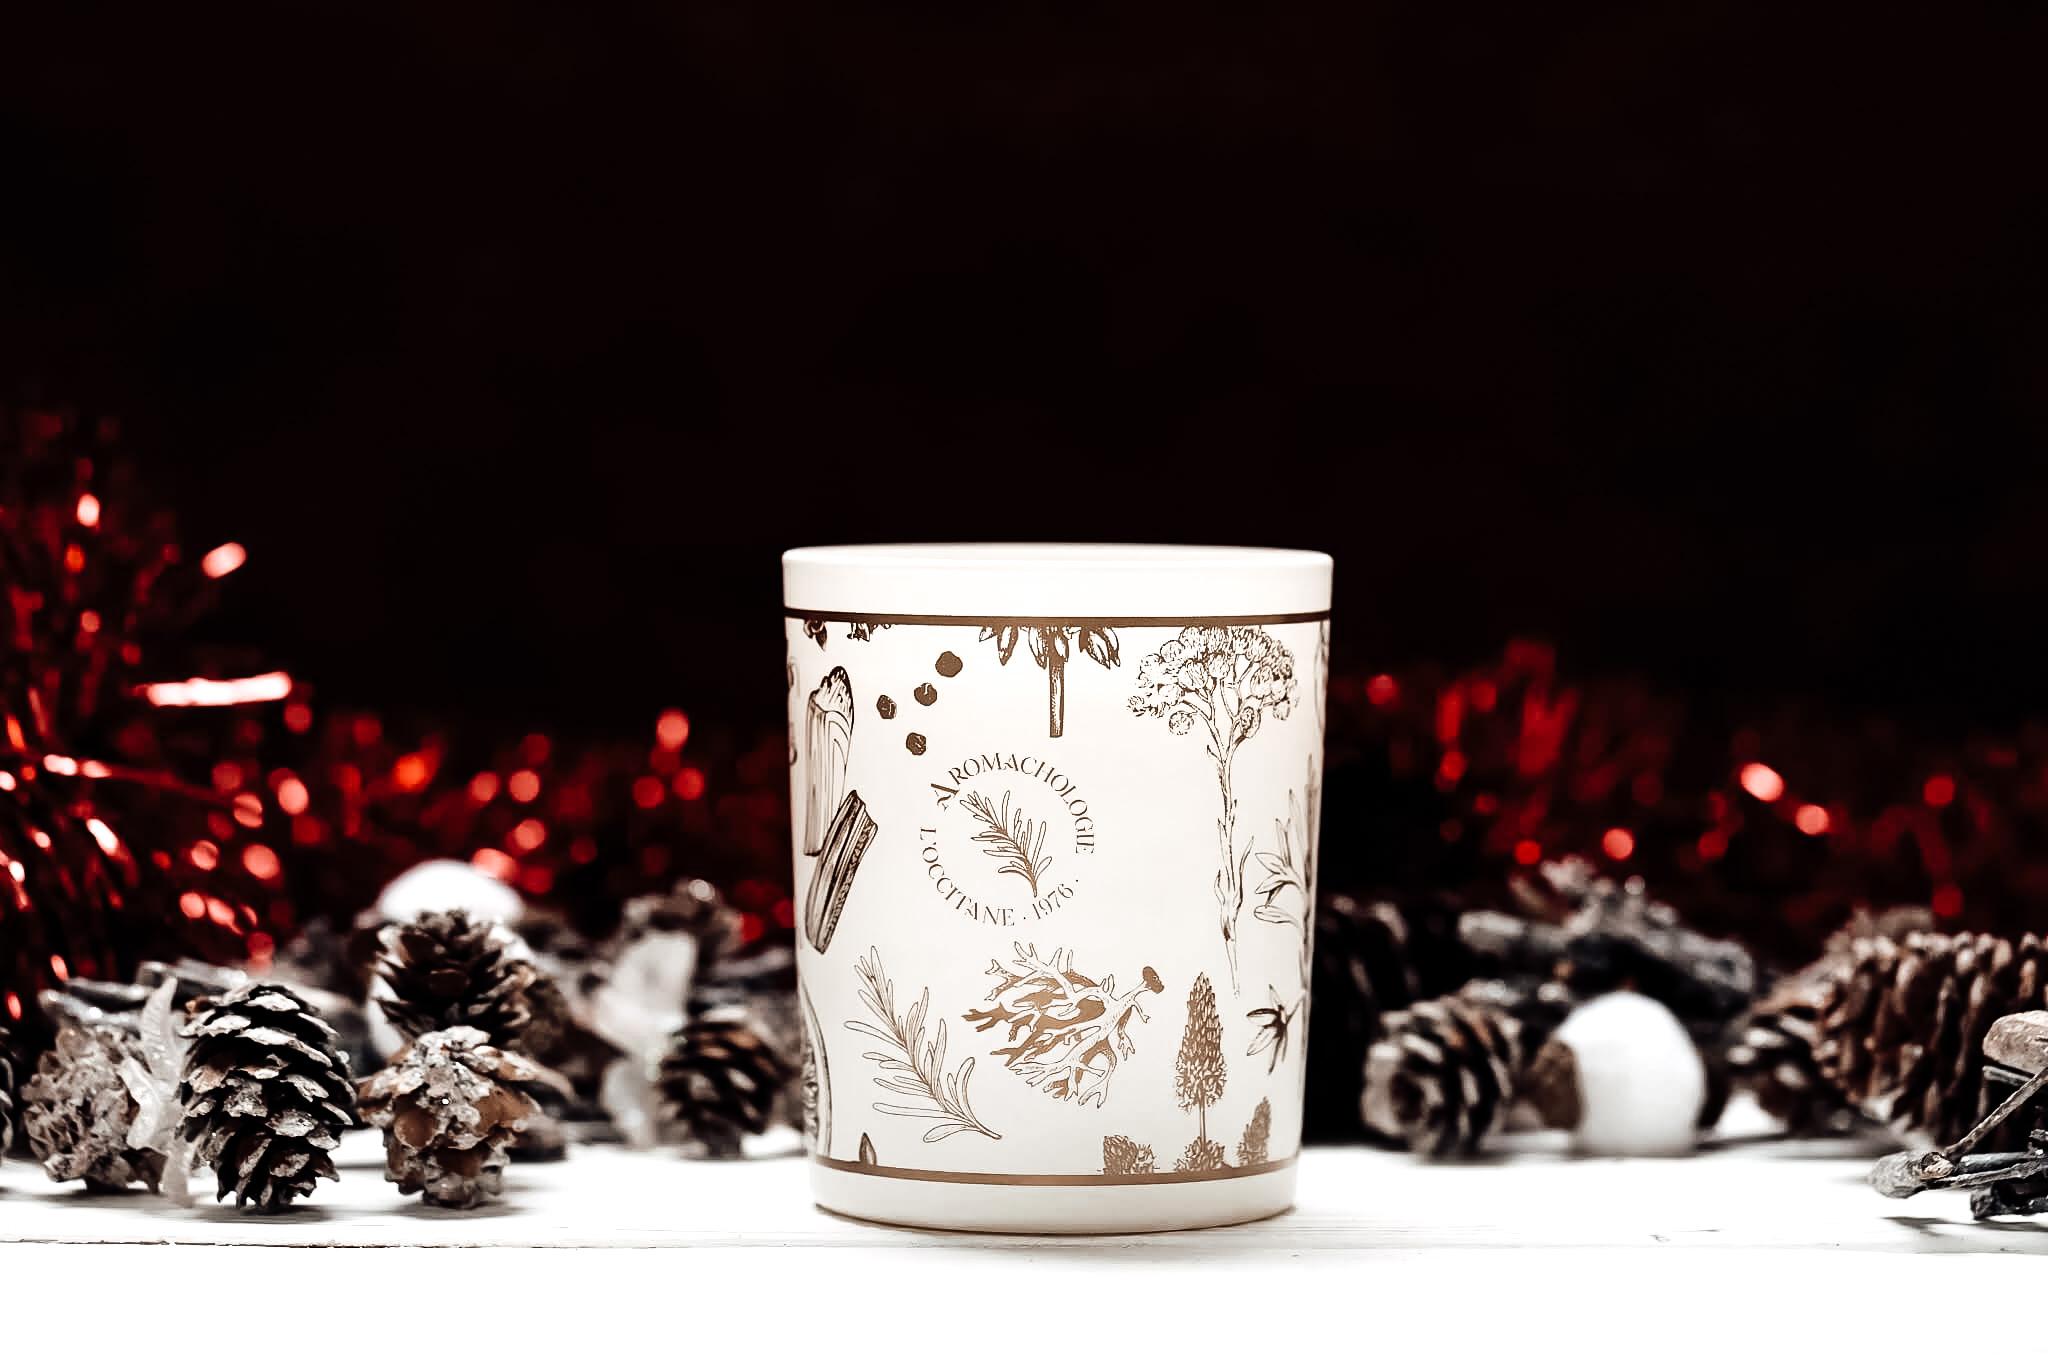 L'Occitane Bougie Parfumée Noël 13 Desserts